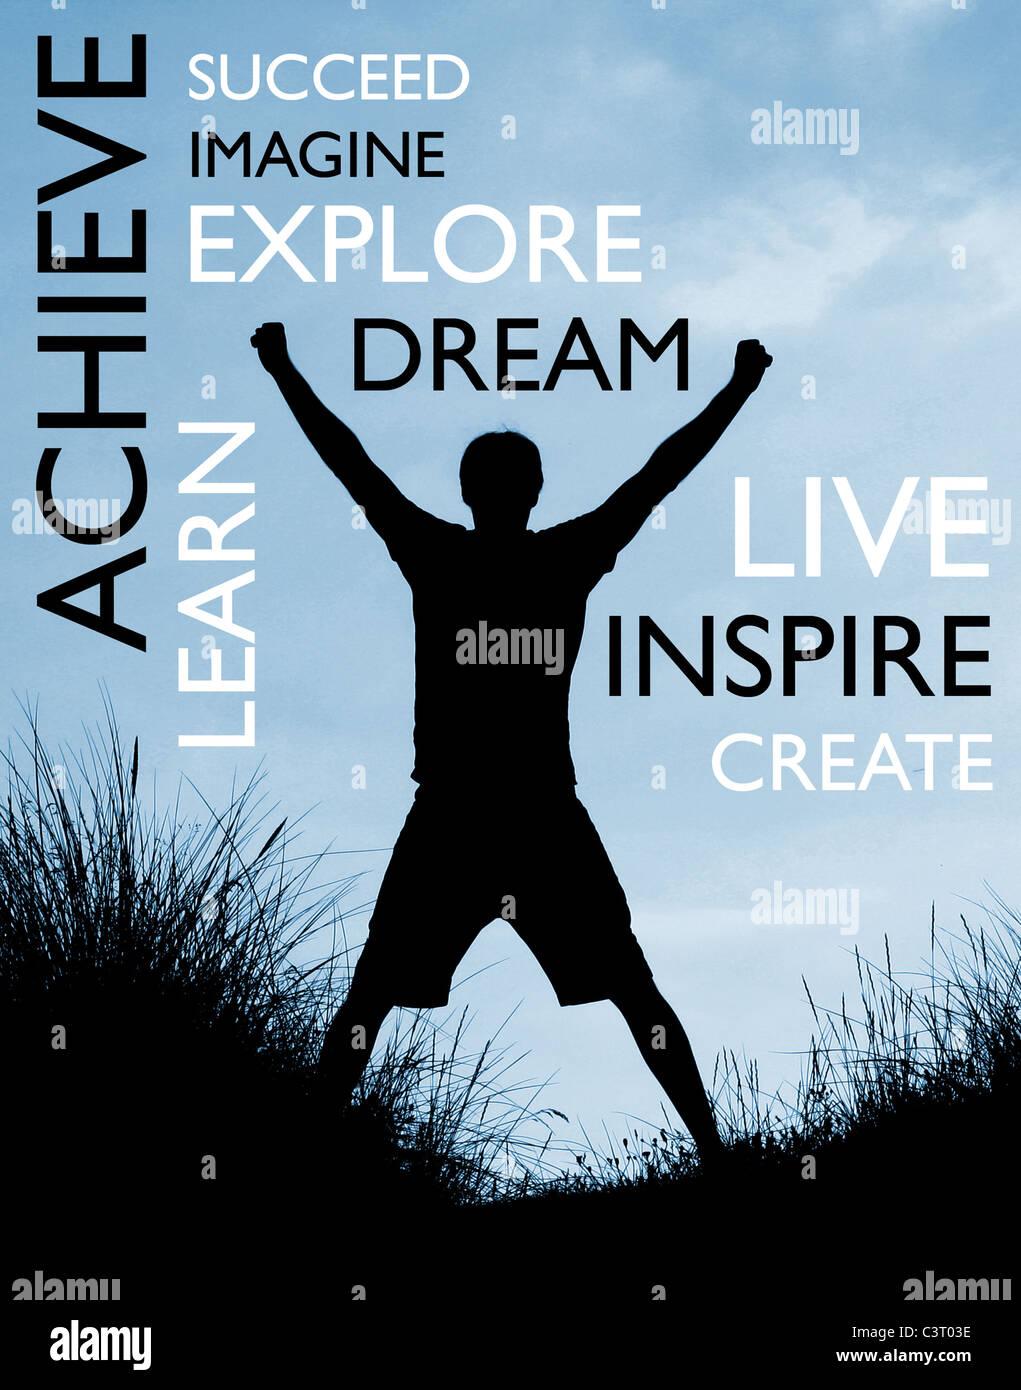 Achieve success - Stock Image